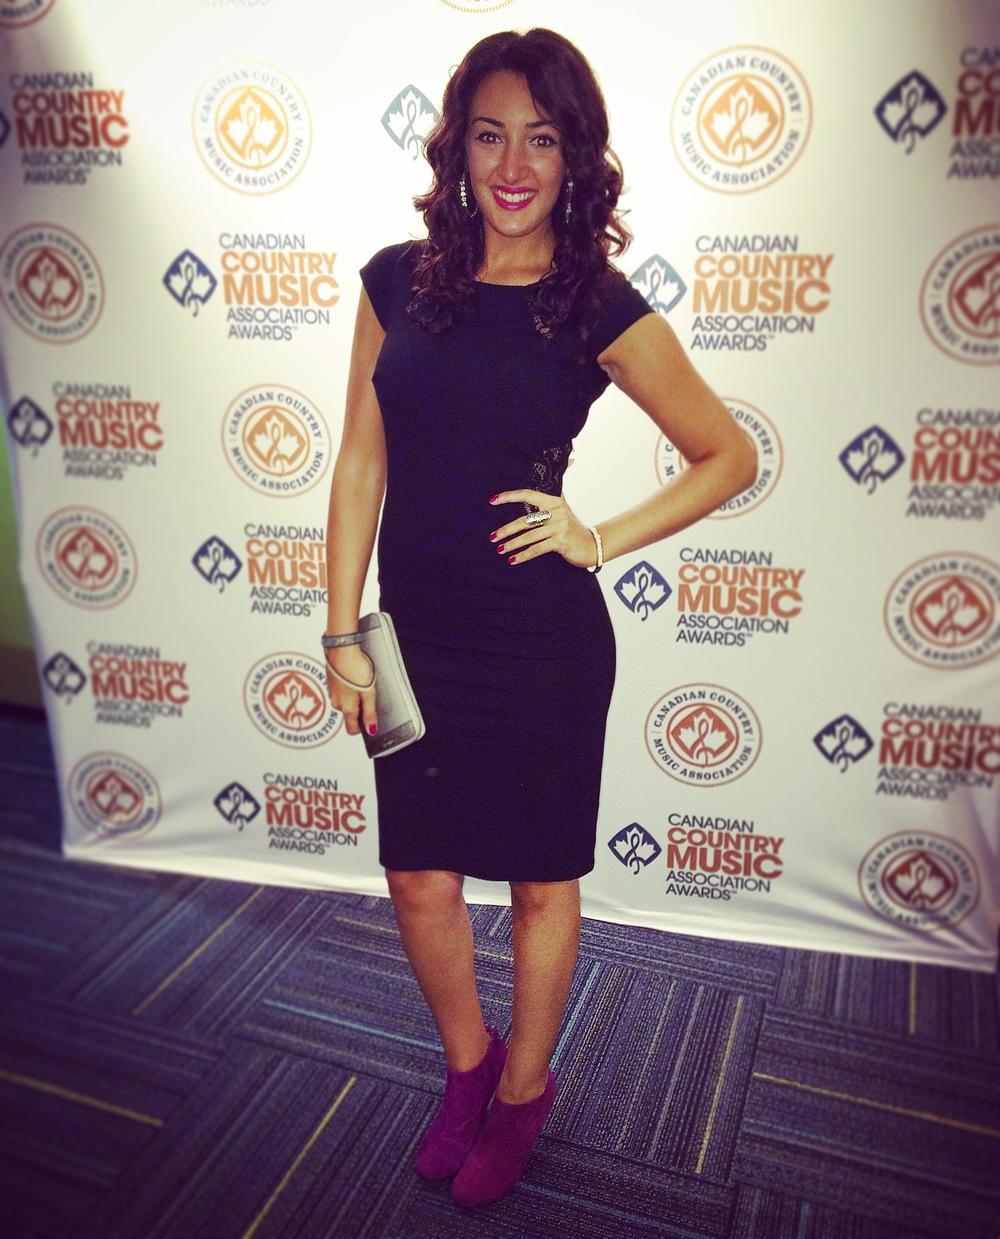 CCMA '15 Gala Awards (Halifax, NS)